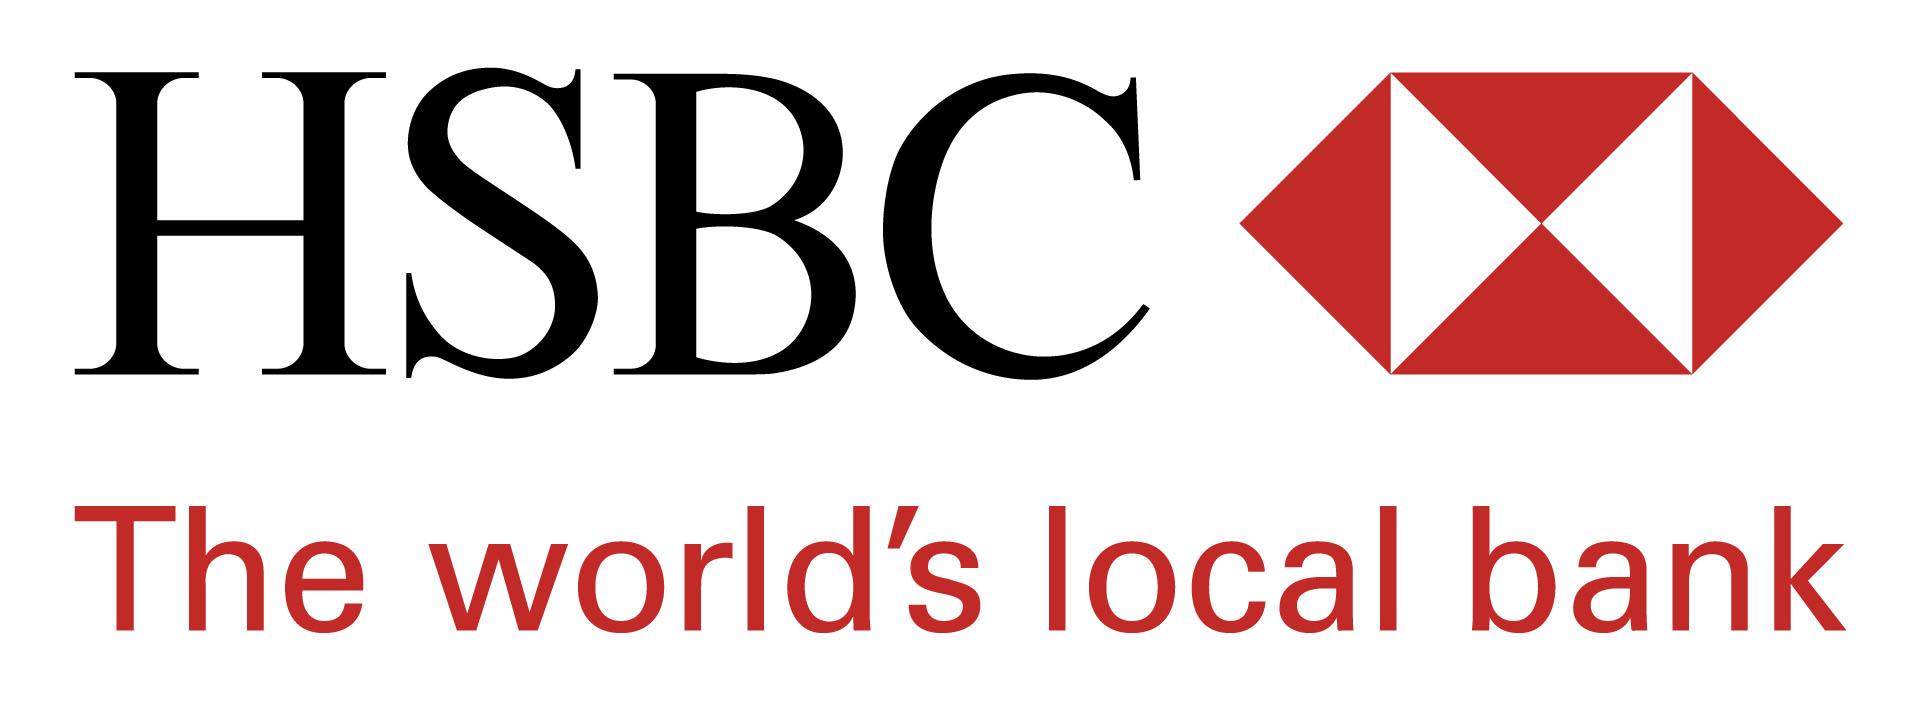 HSBC_4C83.jpg